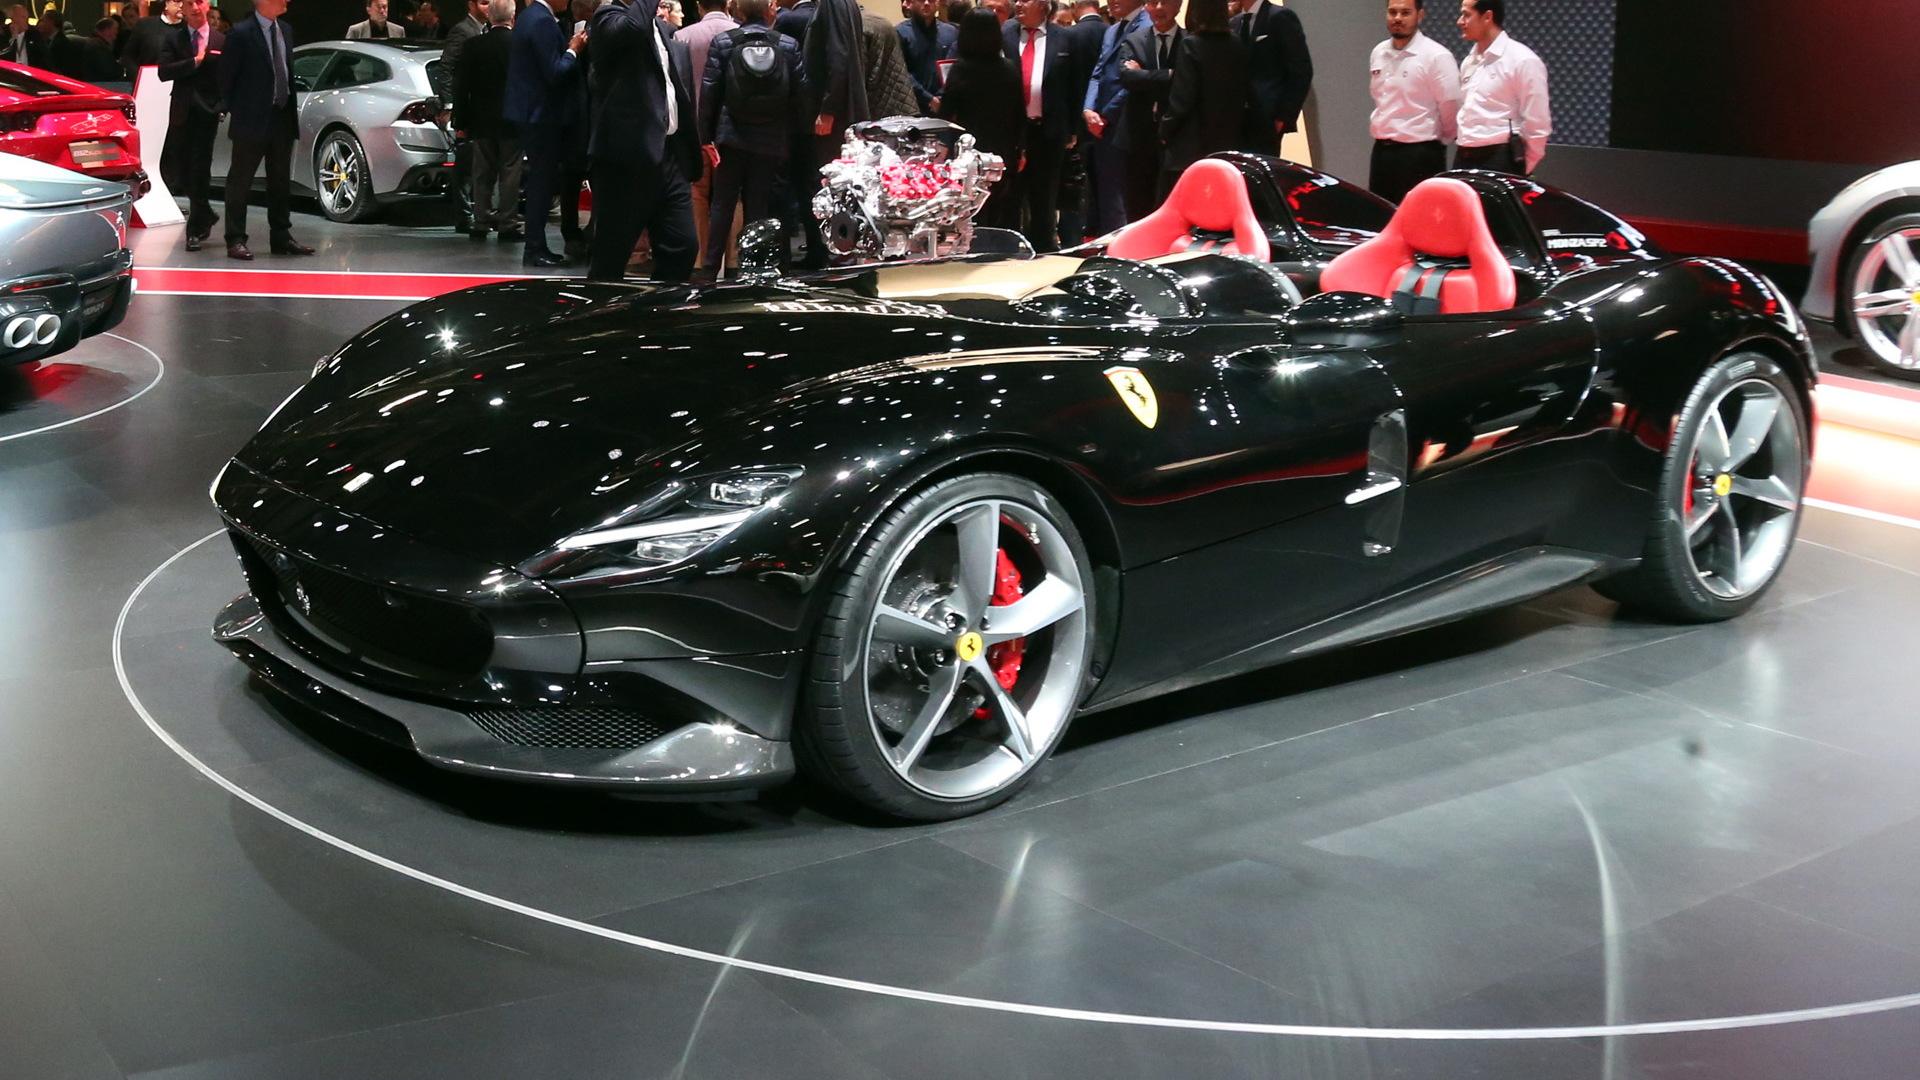 Ferrari Monza SP2, 2018 Paris auto show